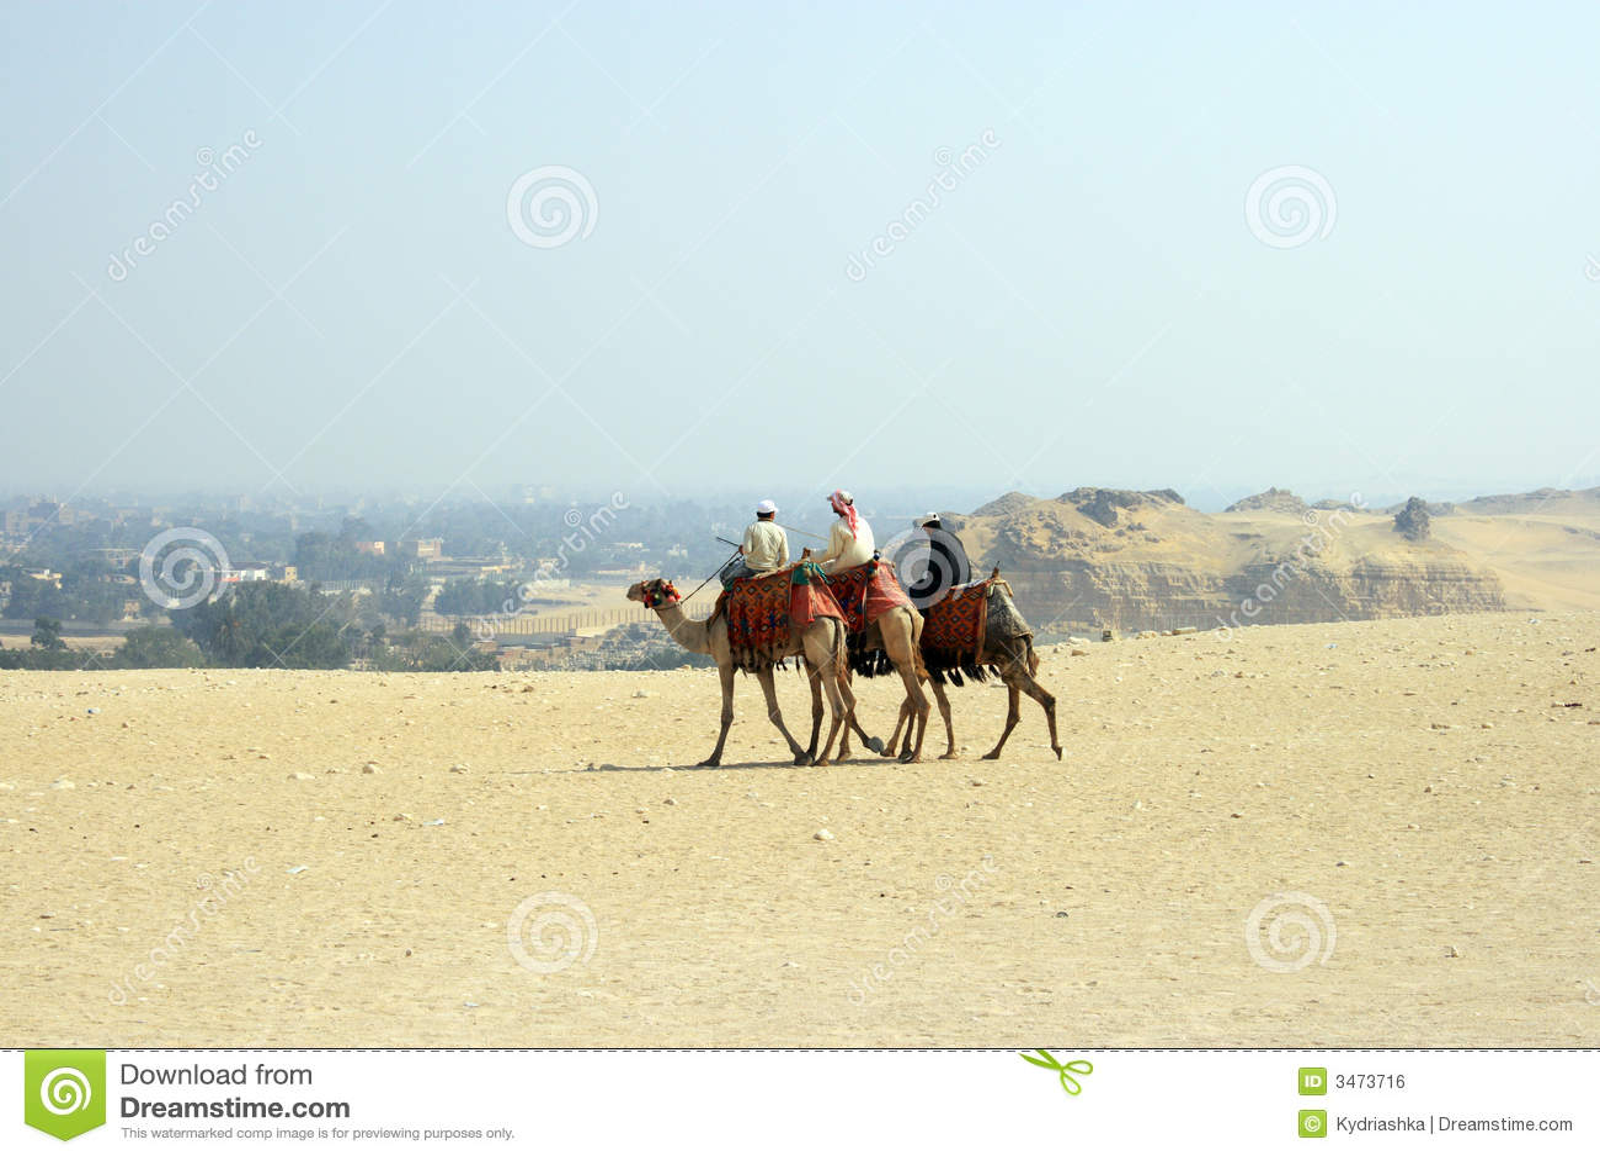 arabian men in desert royalty free stock image image